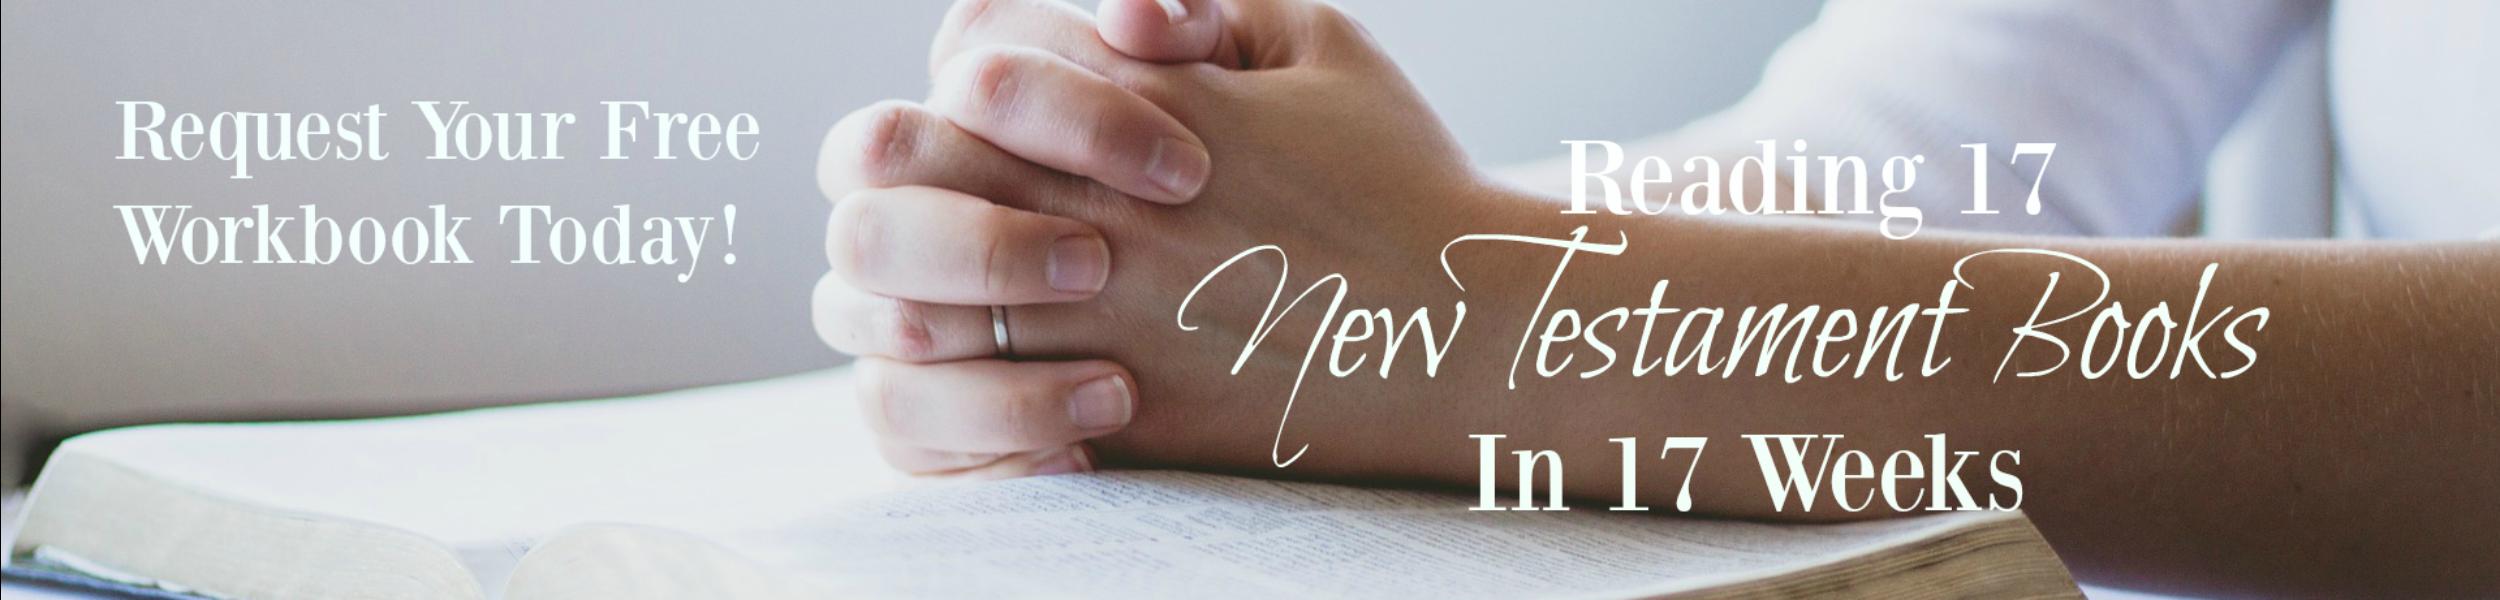 reading-17-new-testament-books-3